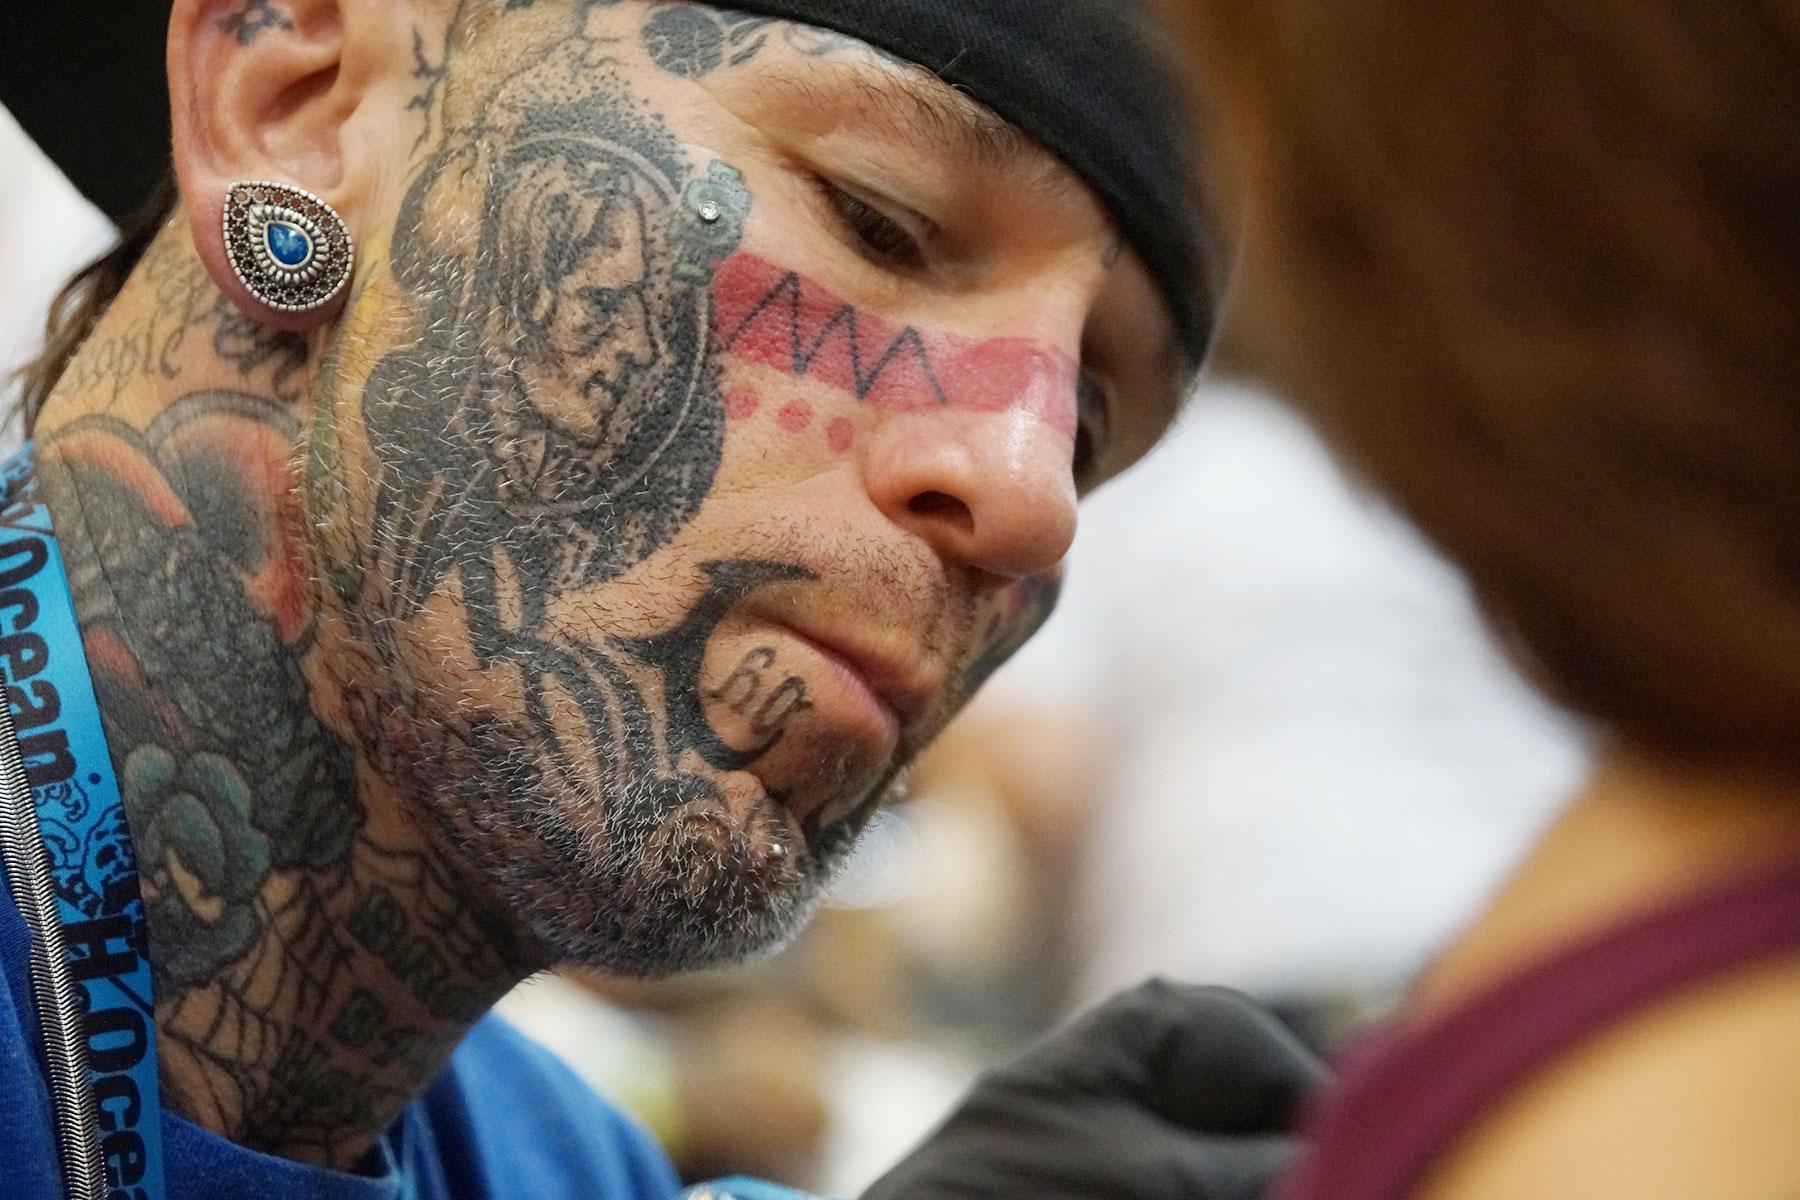 Tattoo convention draws inked bodies as living art the for Eddies tattoos philadelphia